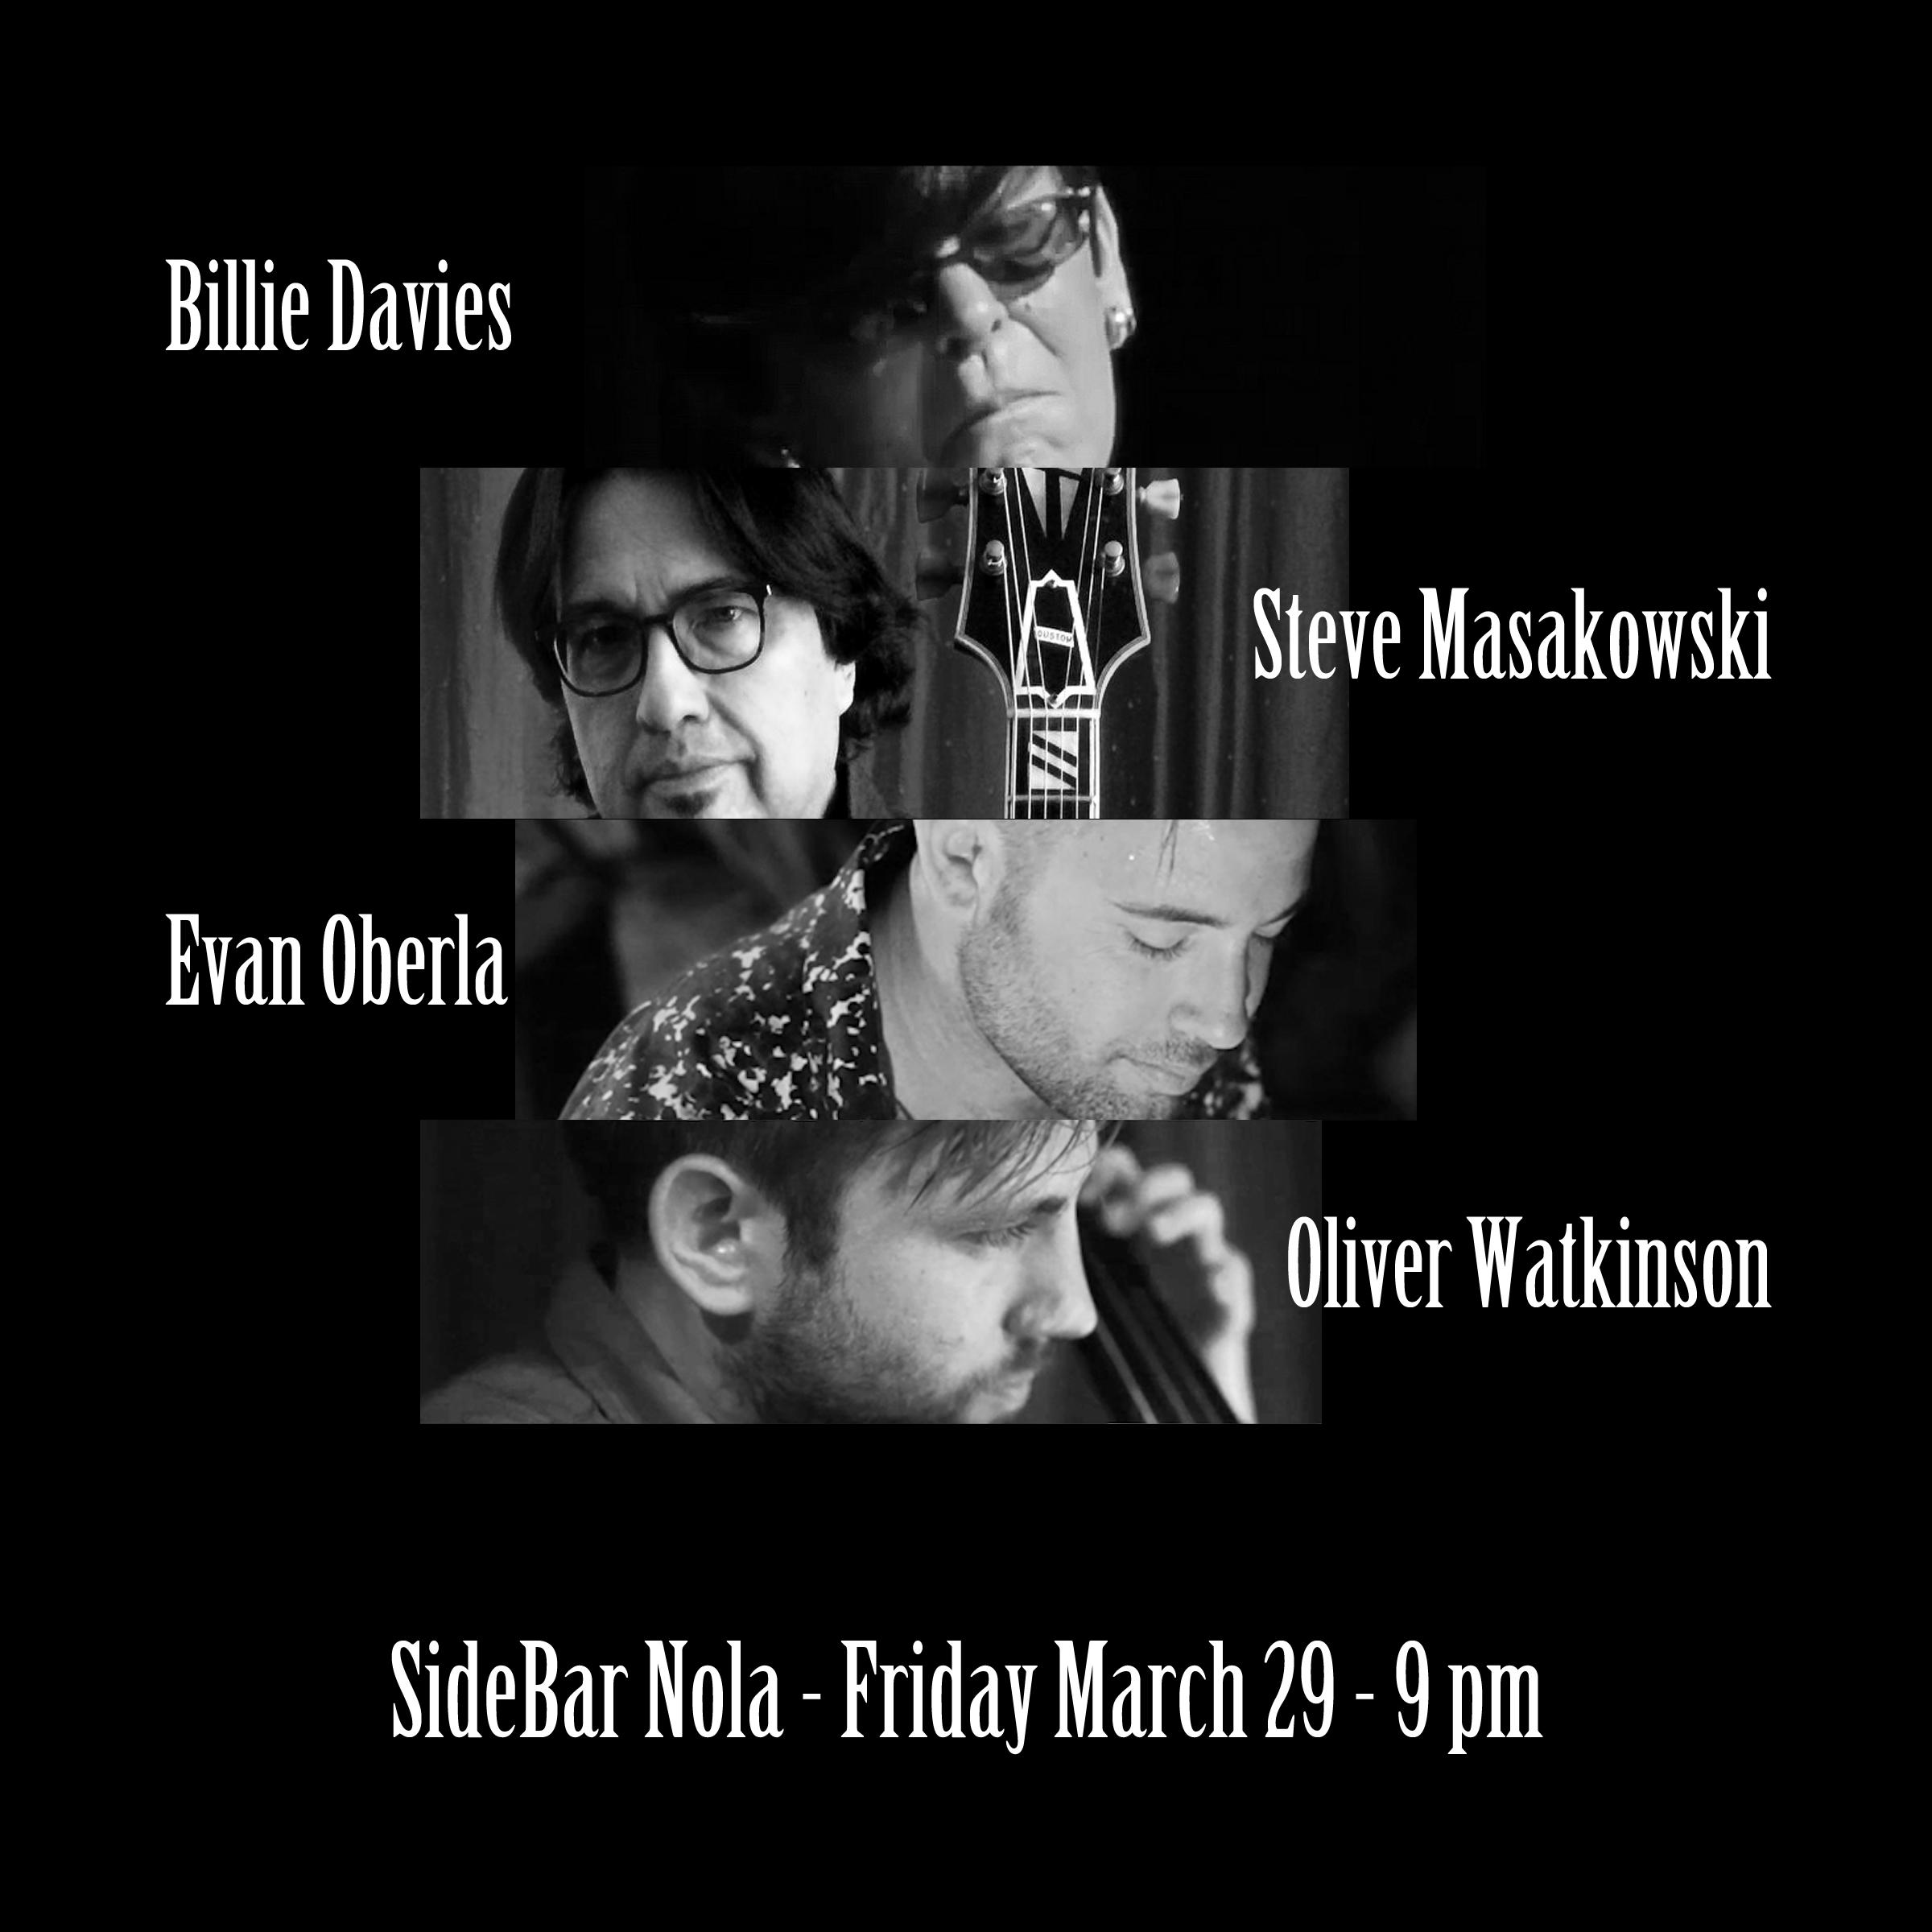 Billie Davies Trio with Steve Masakowski